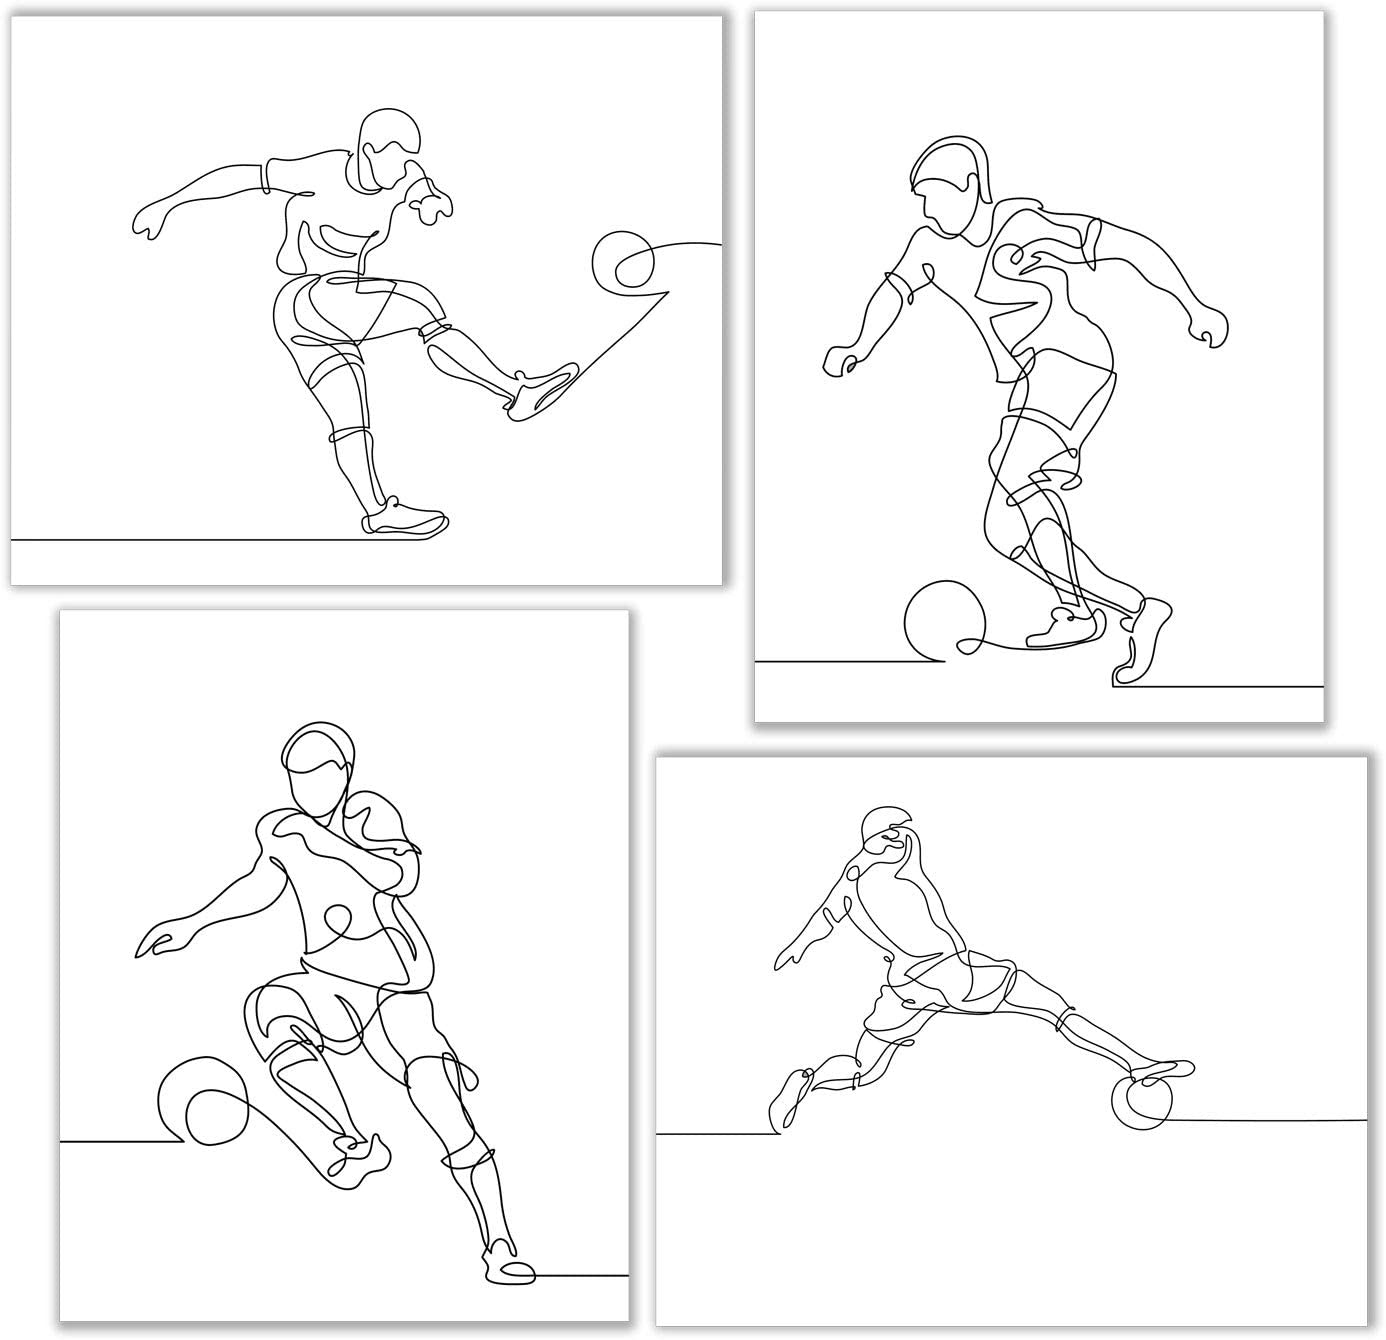 Soccer Minimalist Wall Art Decor Prints - Set of 4 (8x10) Inch Unframed Poster Photos - Kids Bedroom Gift Idea